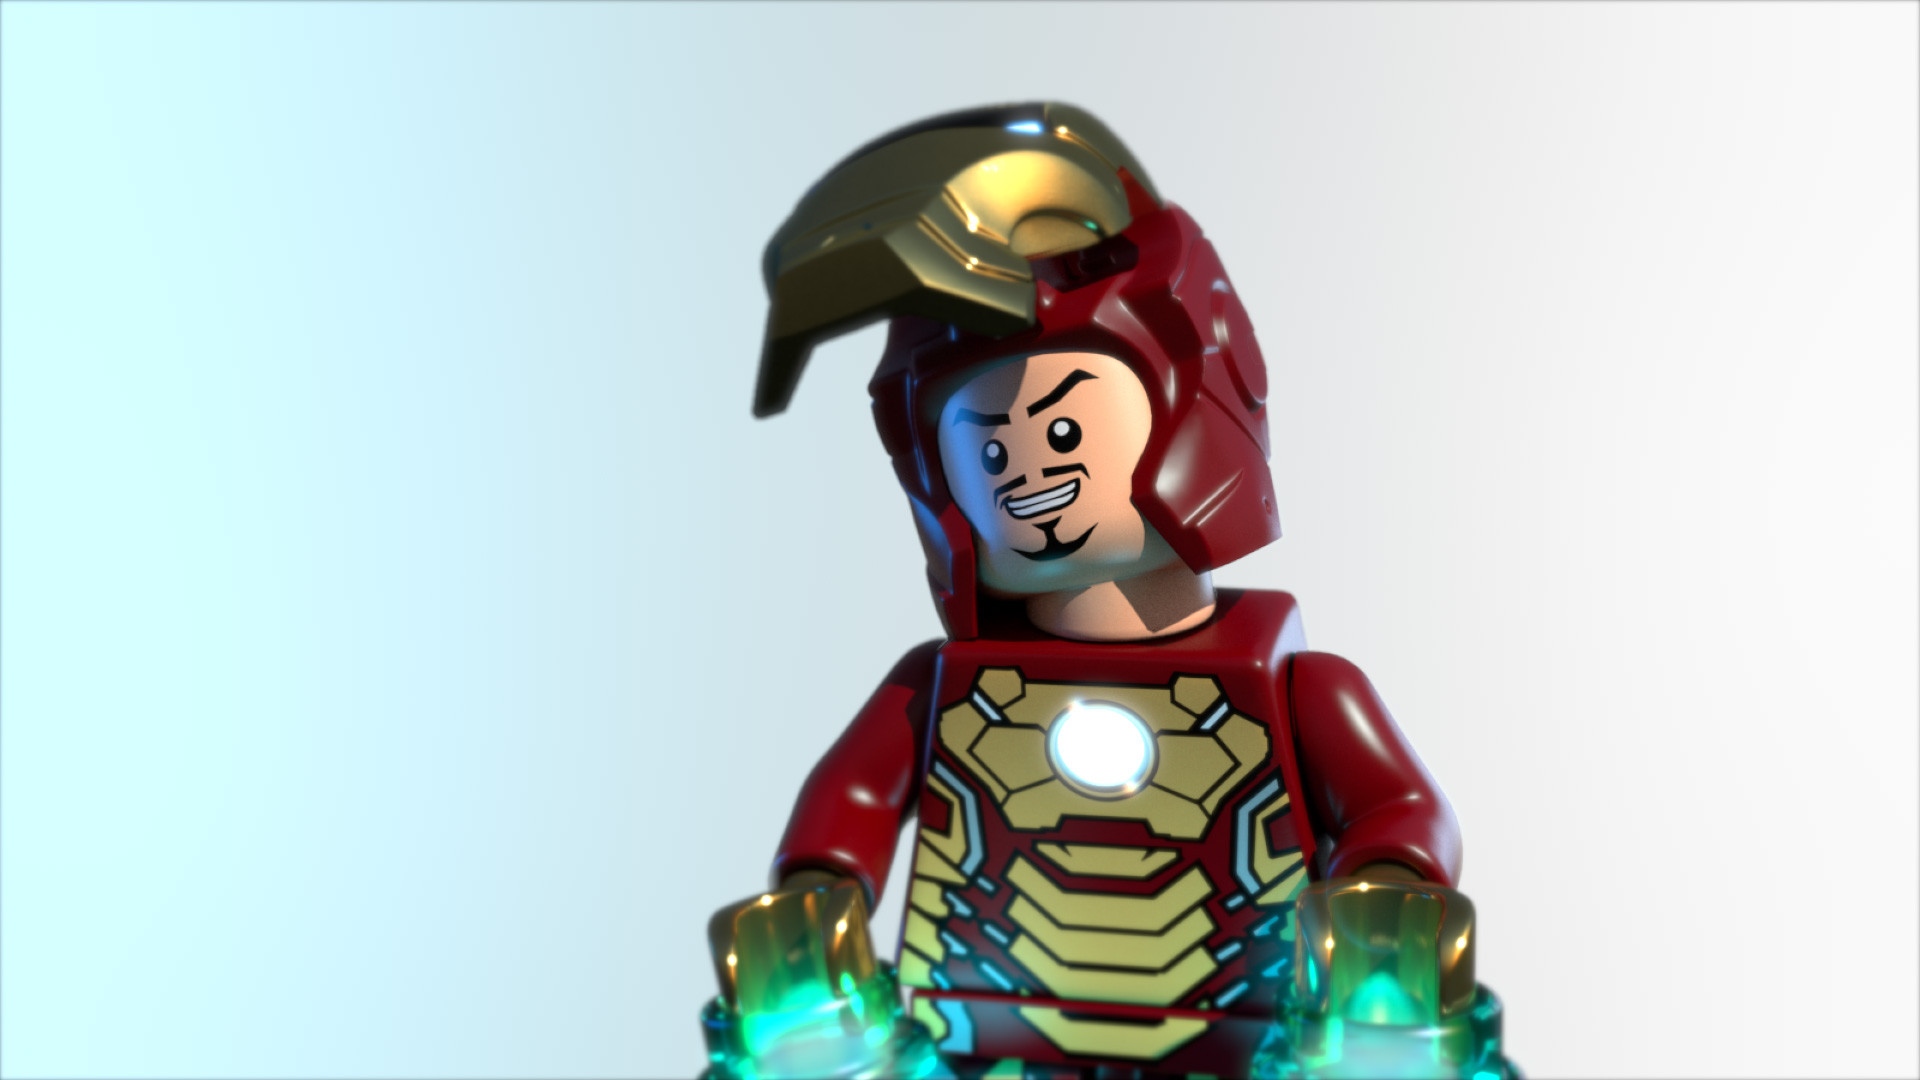 Lego marvel super heroes wallpaper 9 voltagebd Gallery